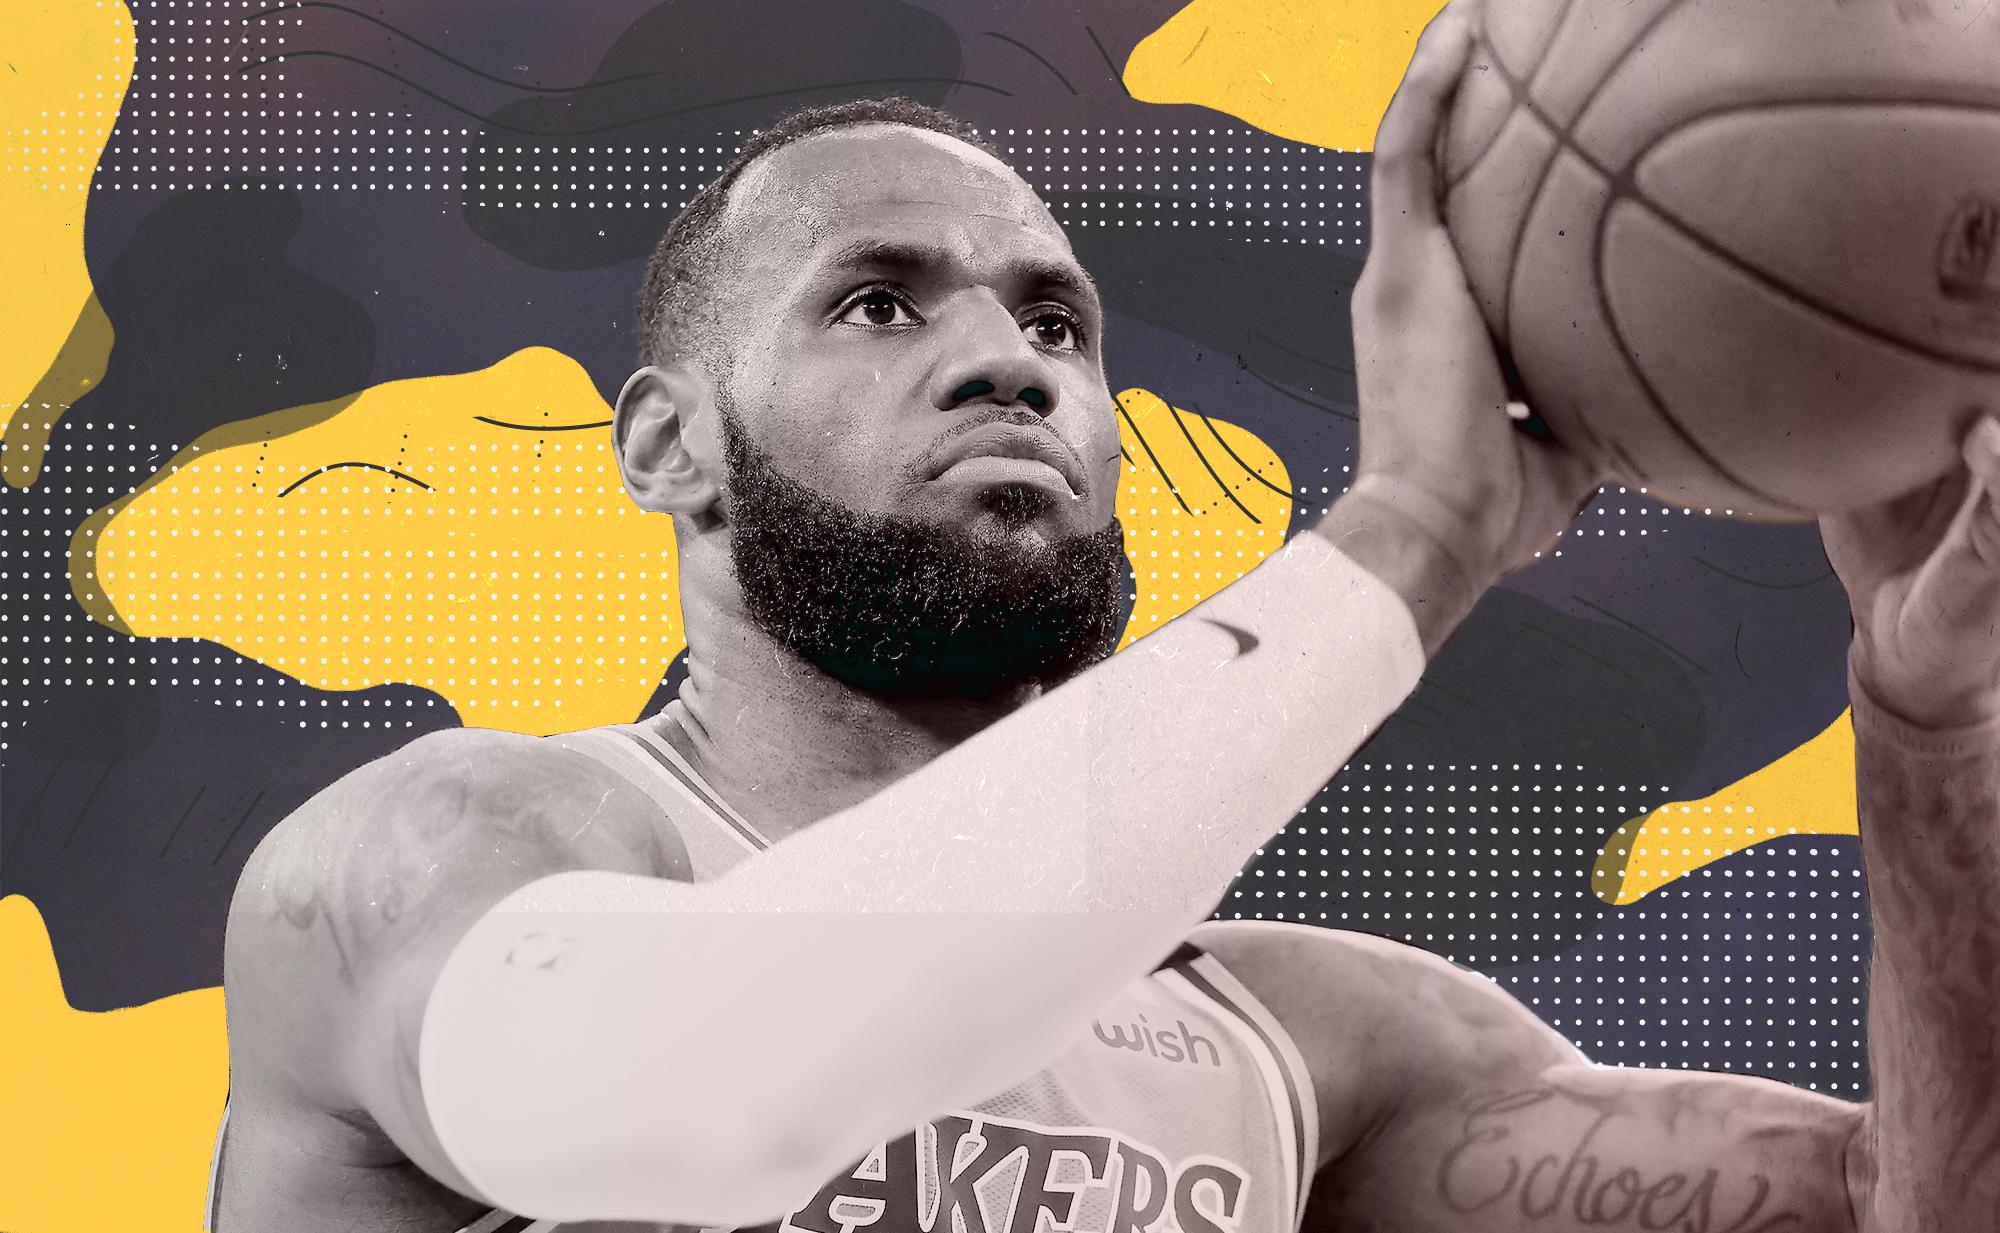 LeBron James isn't shooting as many free throws this season. Why?